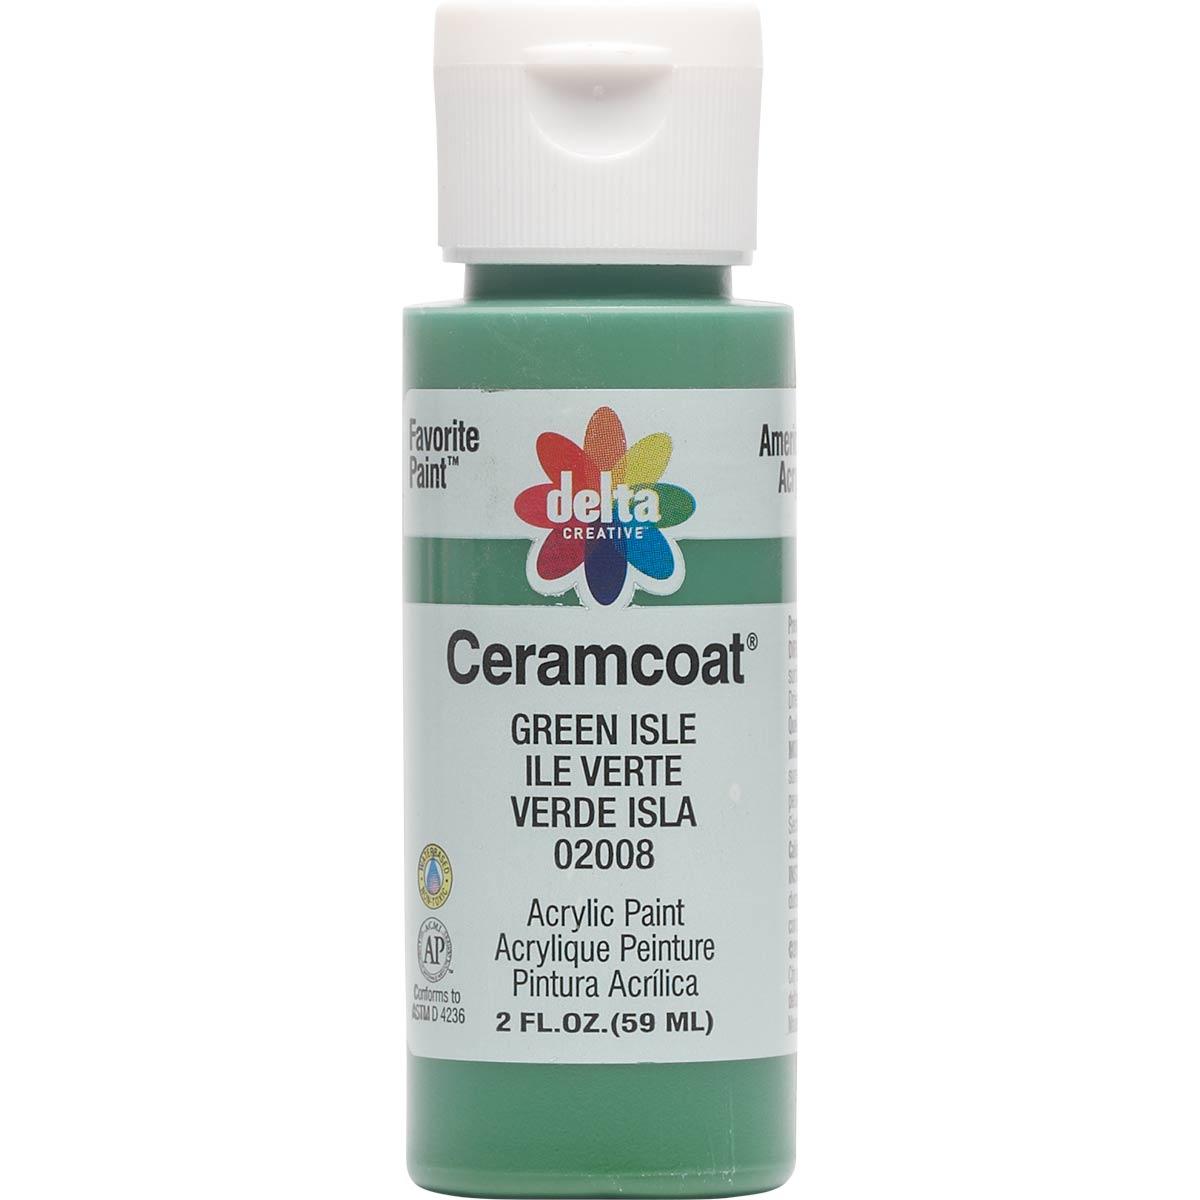 Delta Ceramcoat Acrylic Paint - Green Isle, 2 oz. - 020080202W